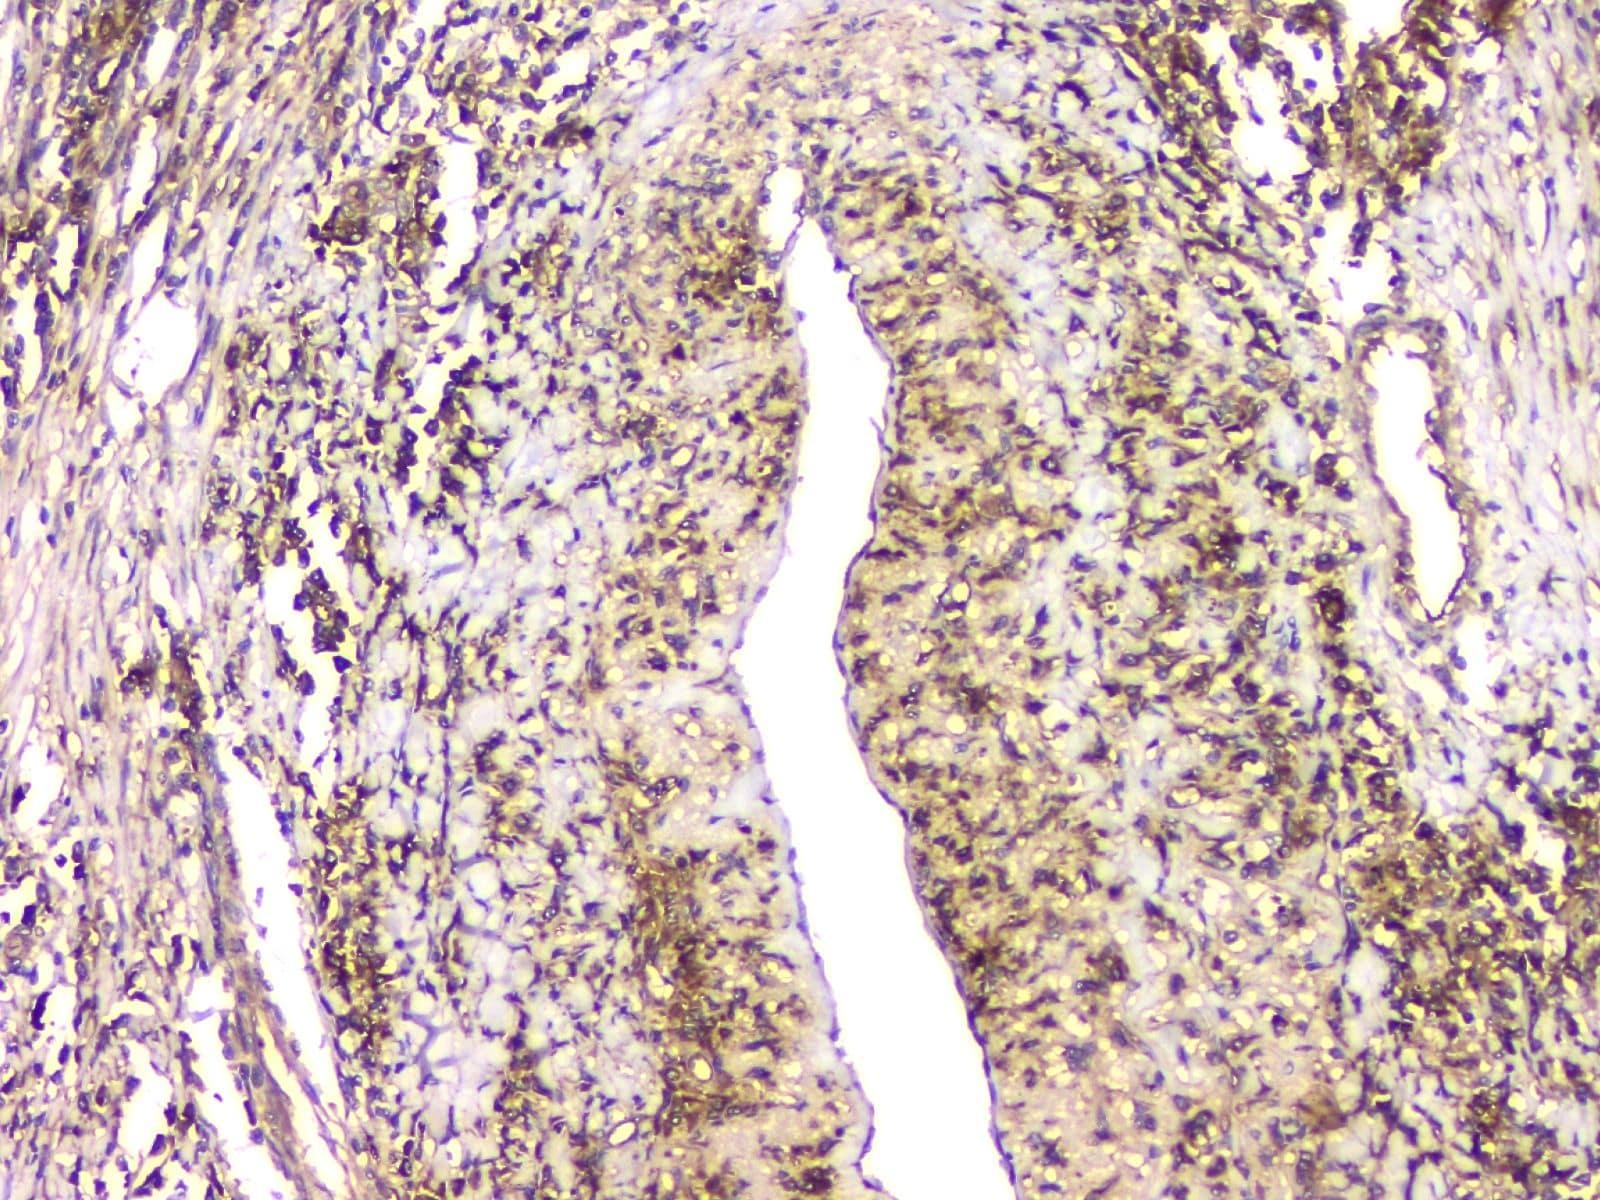 HECTD3 Antibody in Immunohistochemistry (Paraffin) (IHC (P))